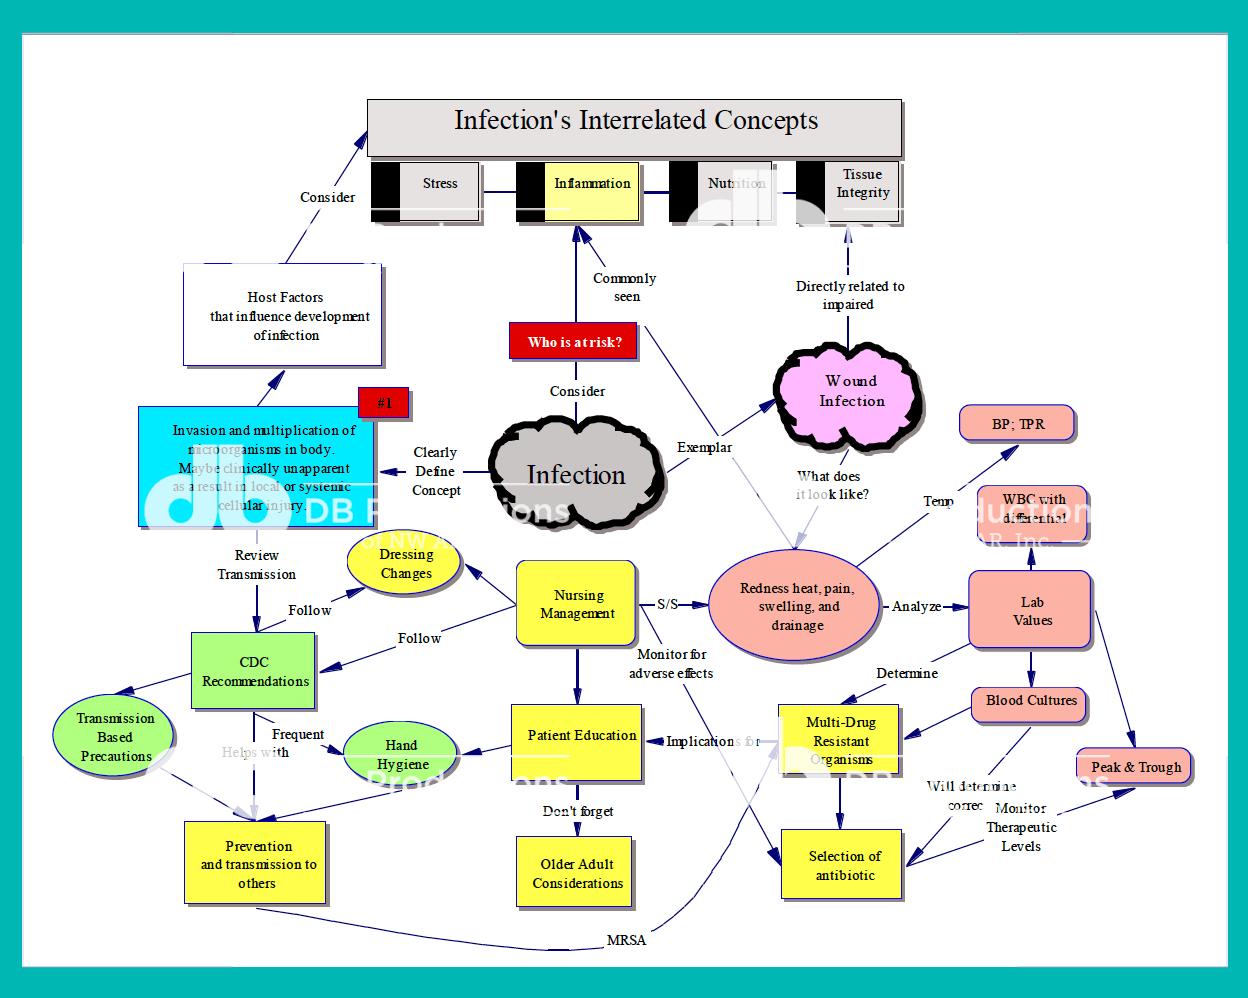 Infection Concept Map Deanne Blach